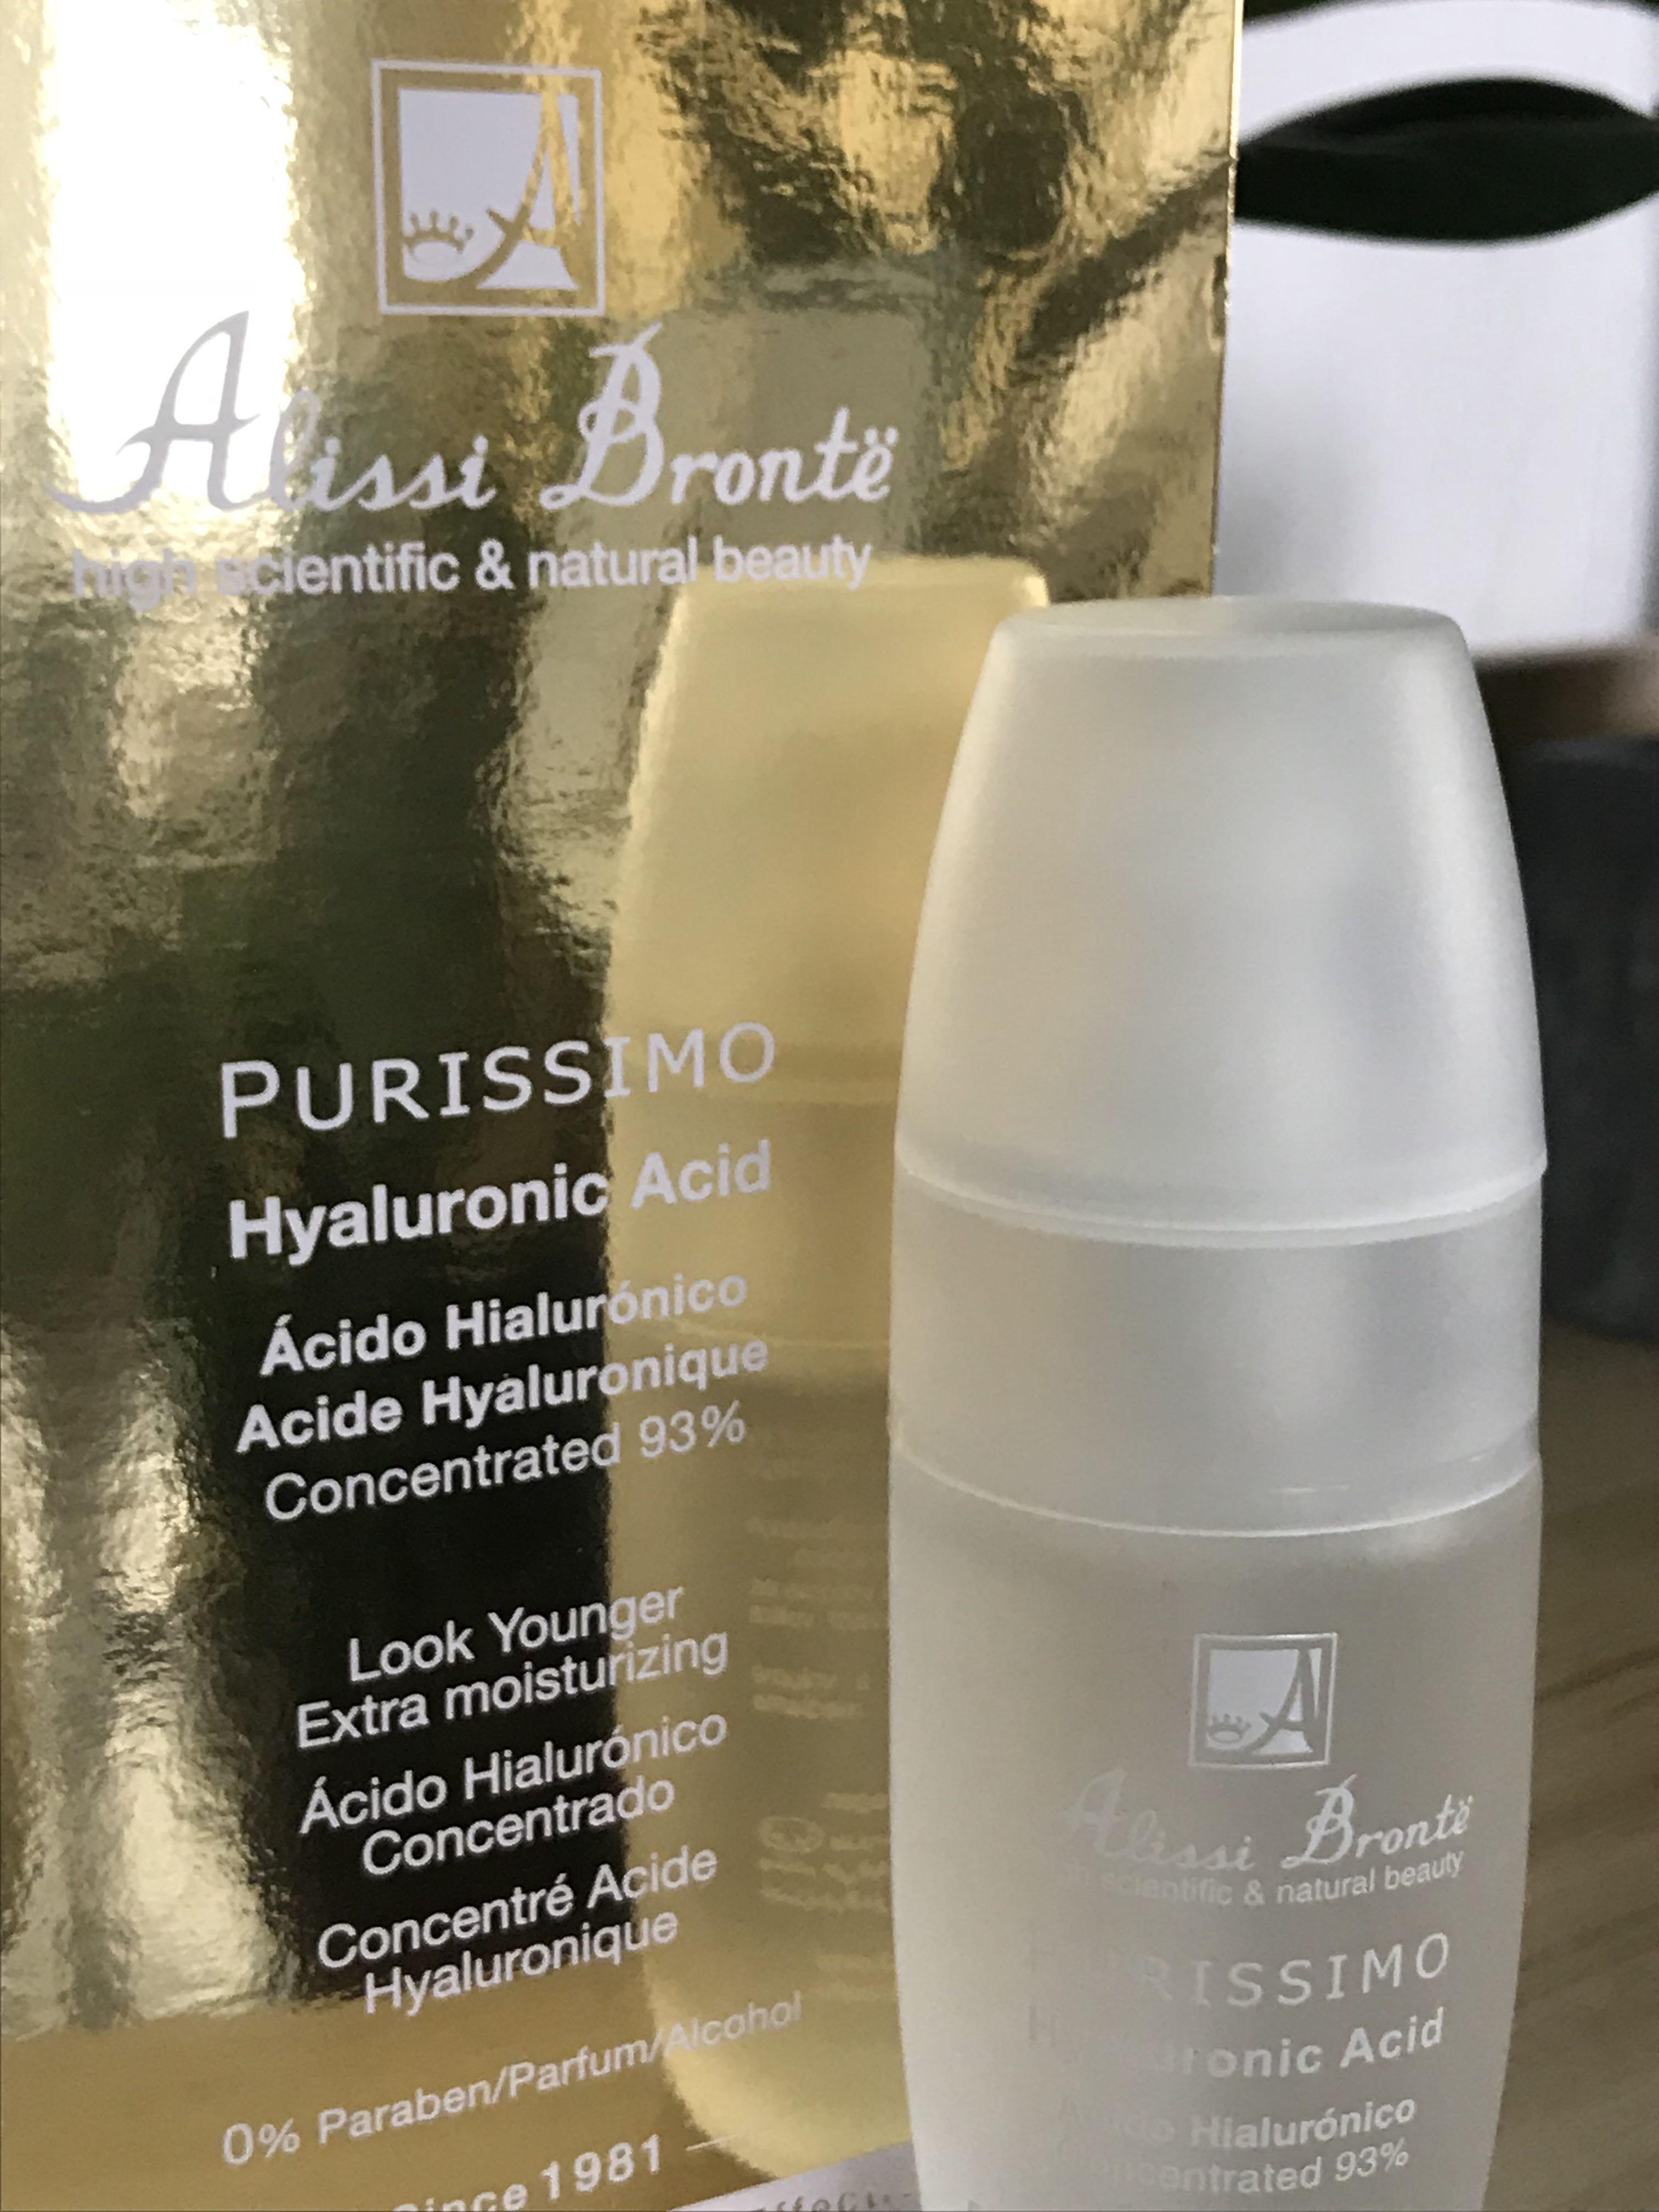 alissi bronte hyaluronic acid的圖片搜尋結果